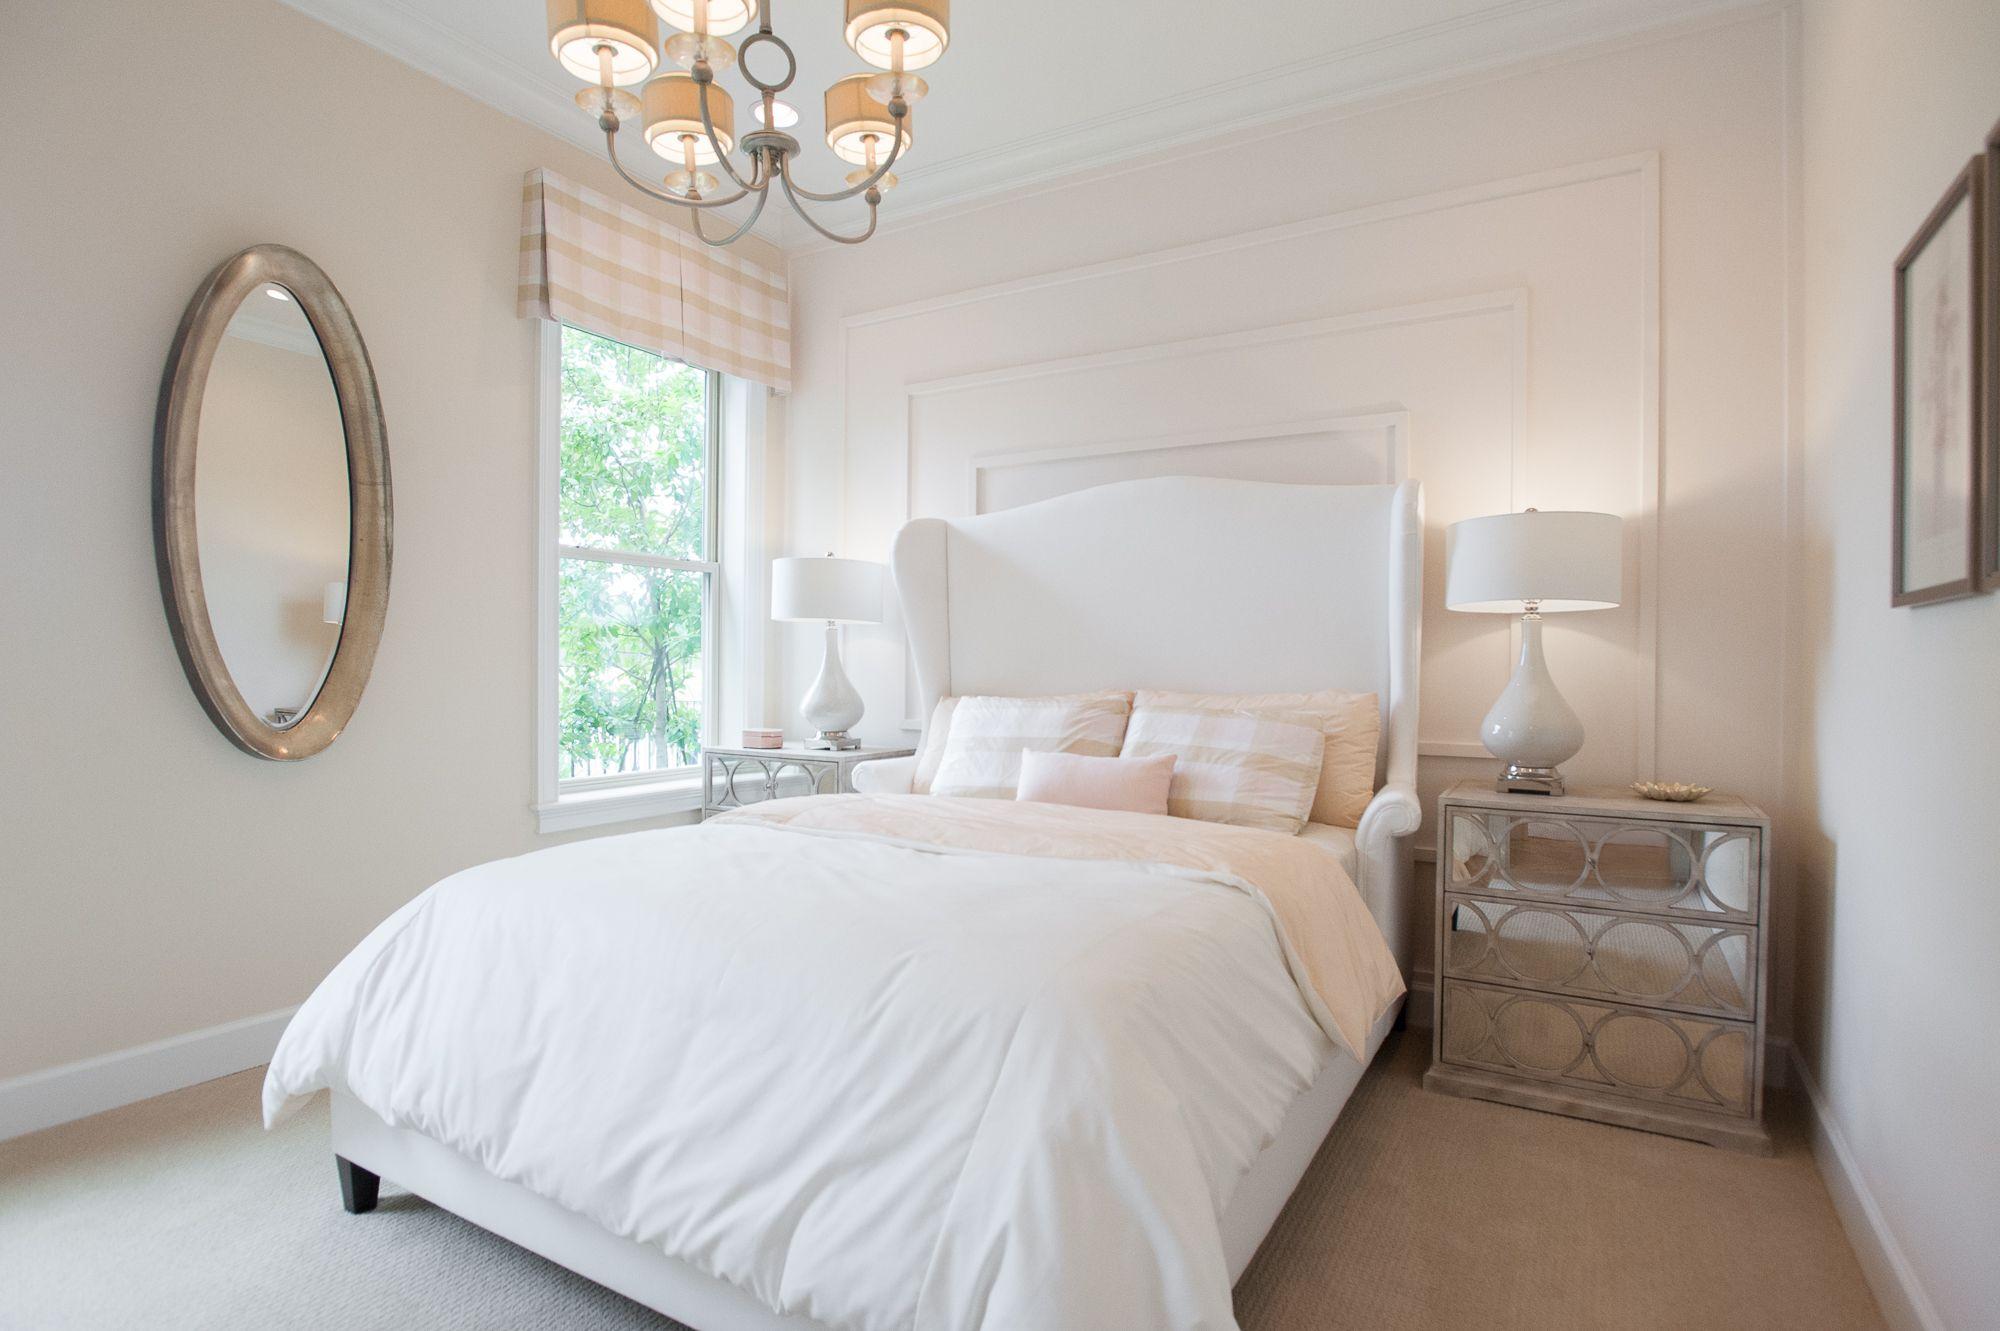 Micamy Design Studio Progress Lighting Progress Lighting Model Homes Home Decor